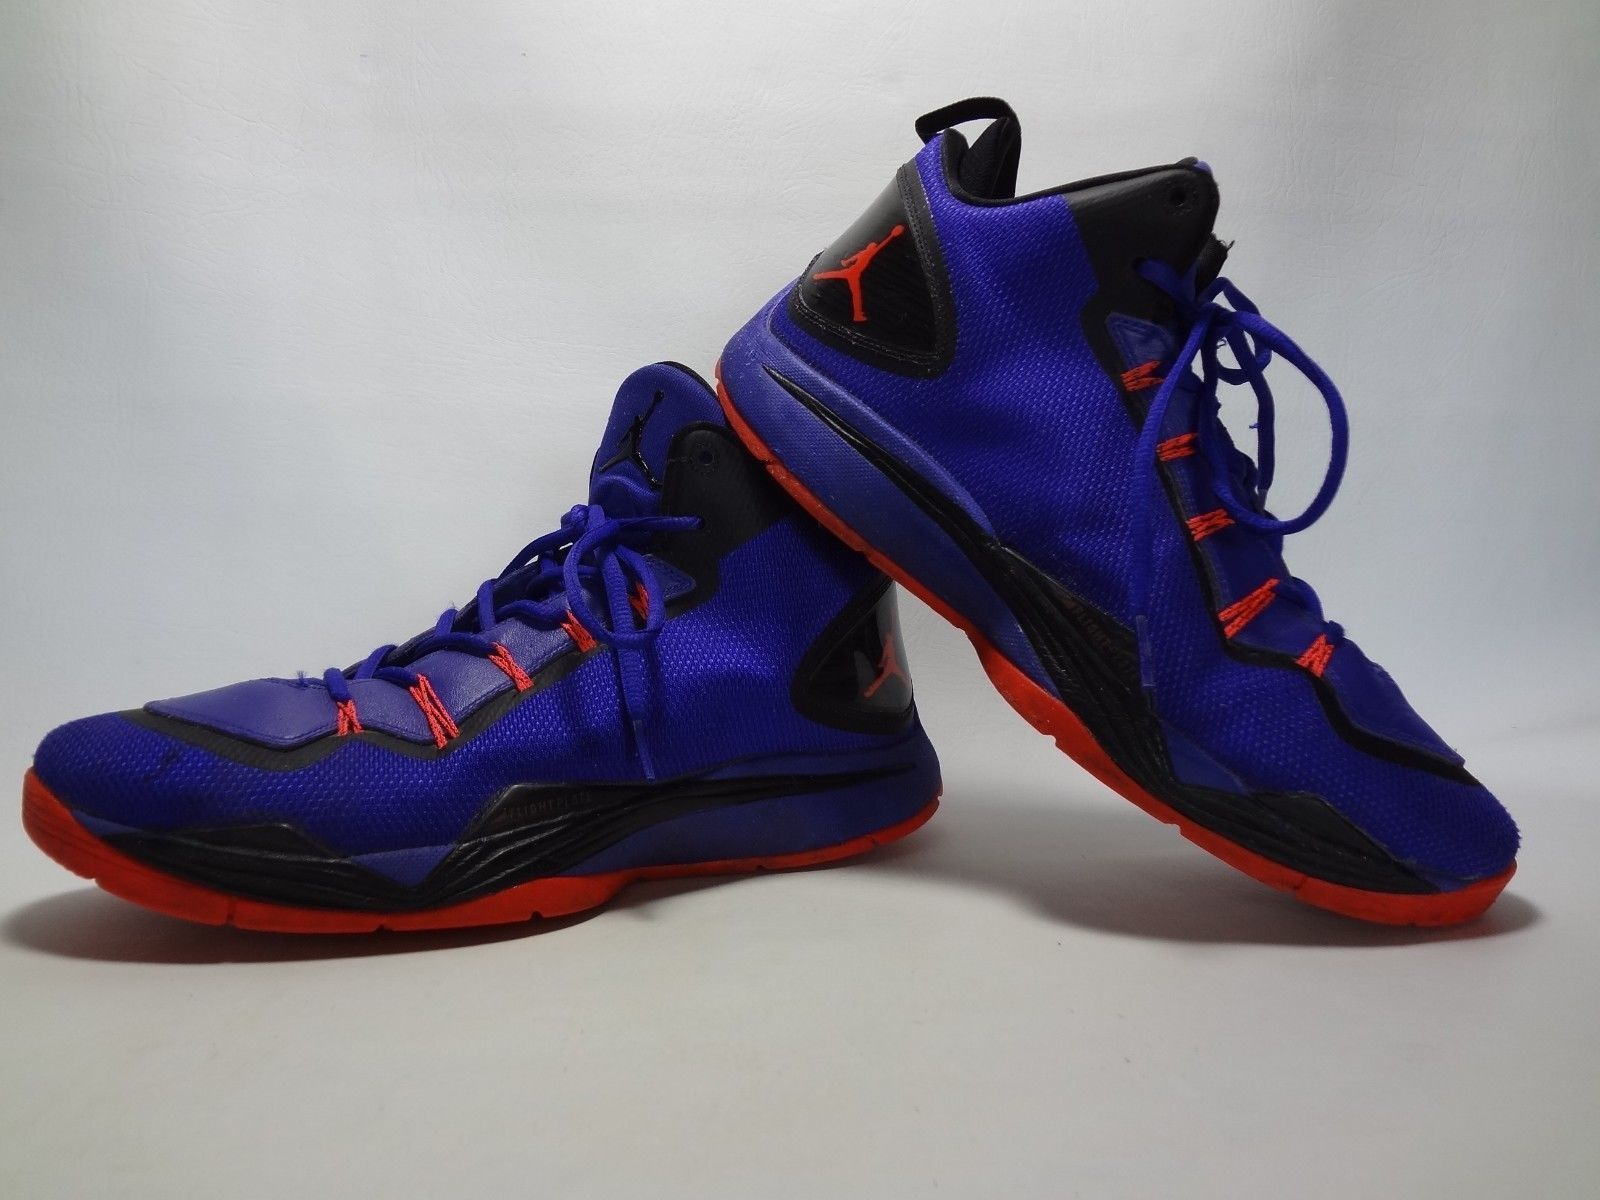 3fb9a3eae0fdbd Nike Air Jordan Super Fly 2 PO Playoffs and 50 similar items. 57